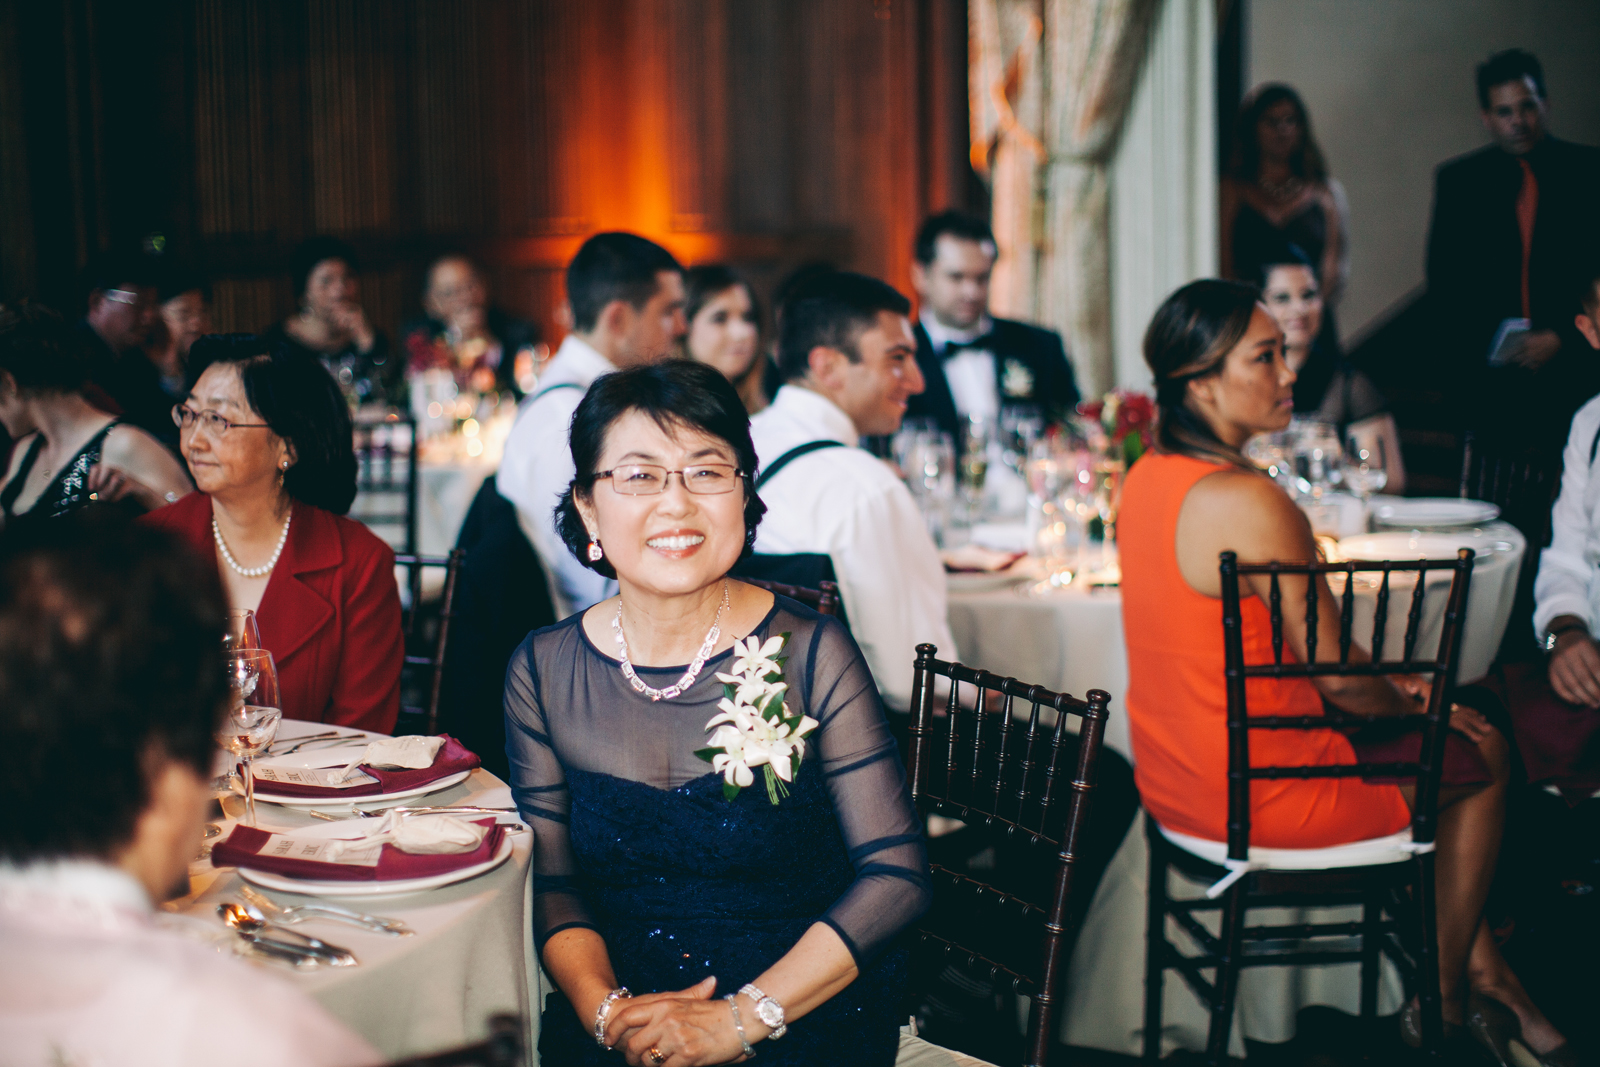 kohl_manison_wedding_photography_sarah_eric_ebony_siovhan_bokeh_photography_087.jpg